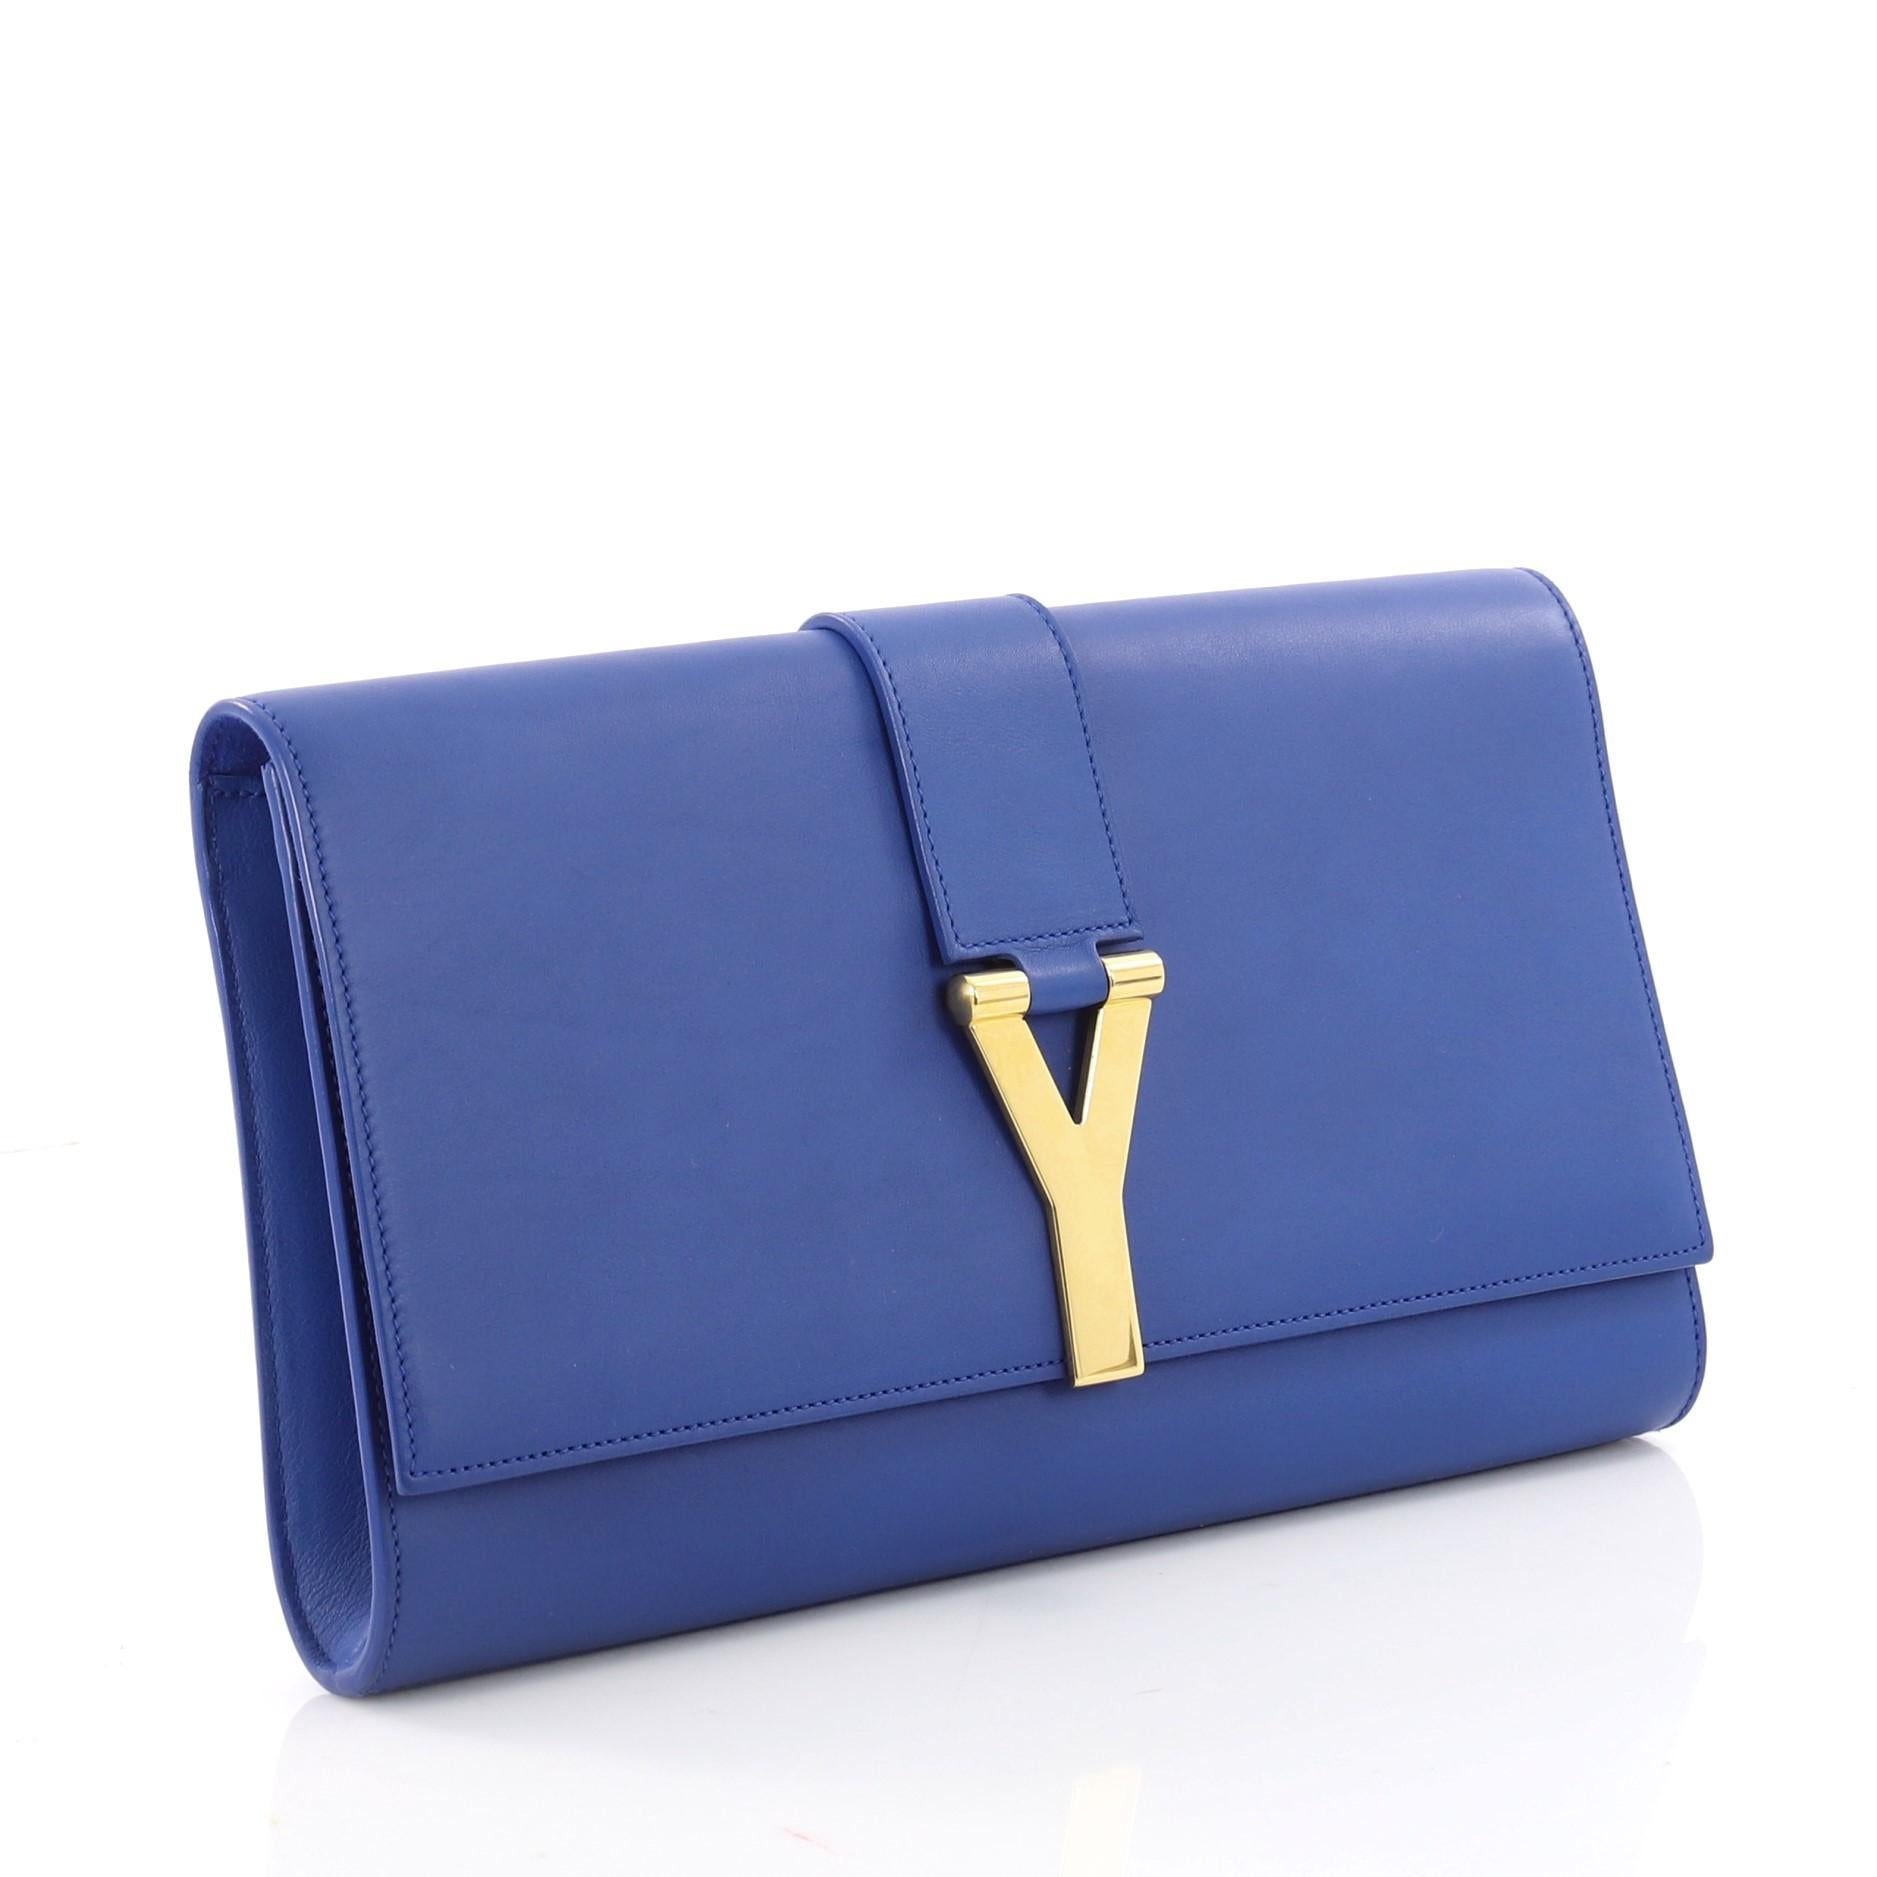 81256b691010 Blue saint laurent clutch leather for sale jpg 768x768 Chyc clutch